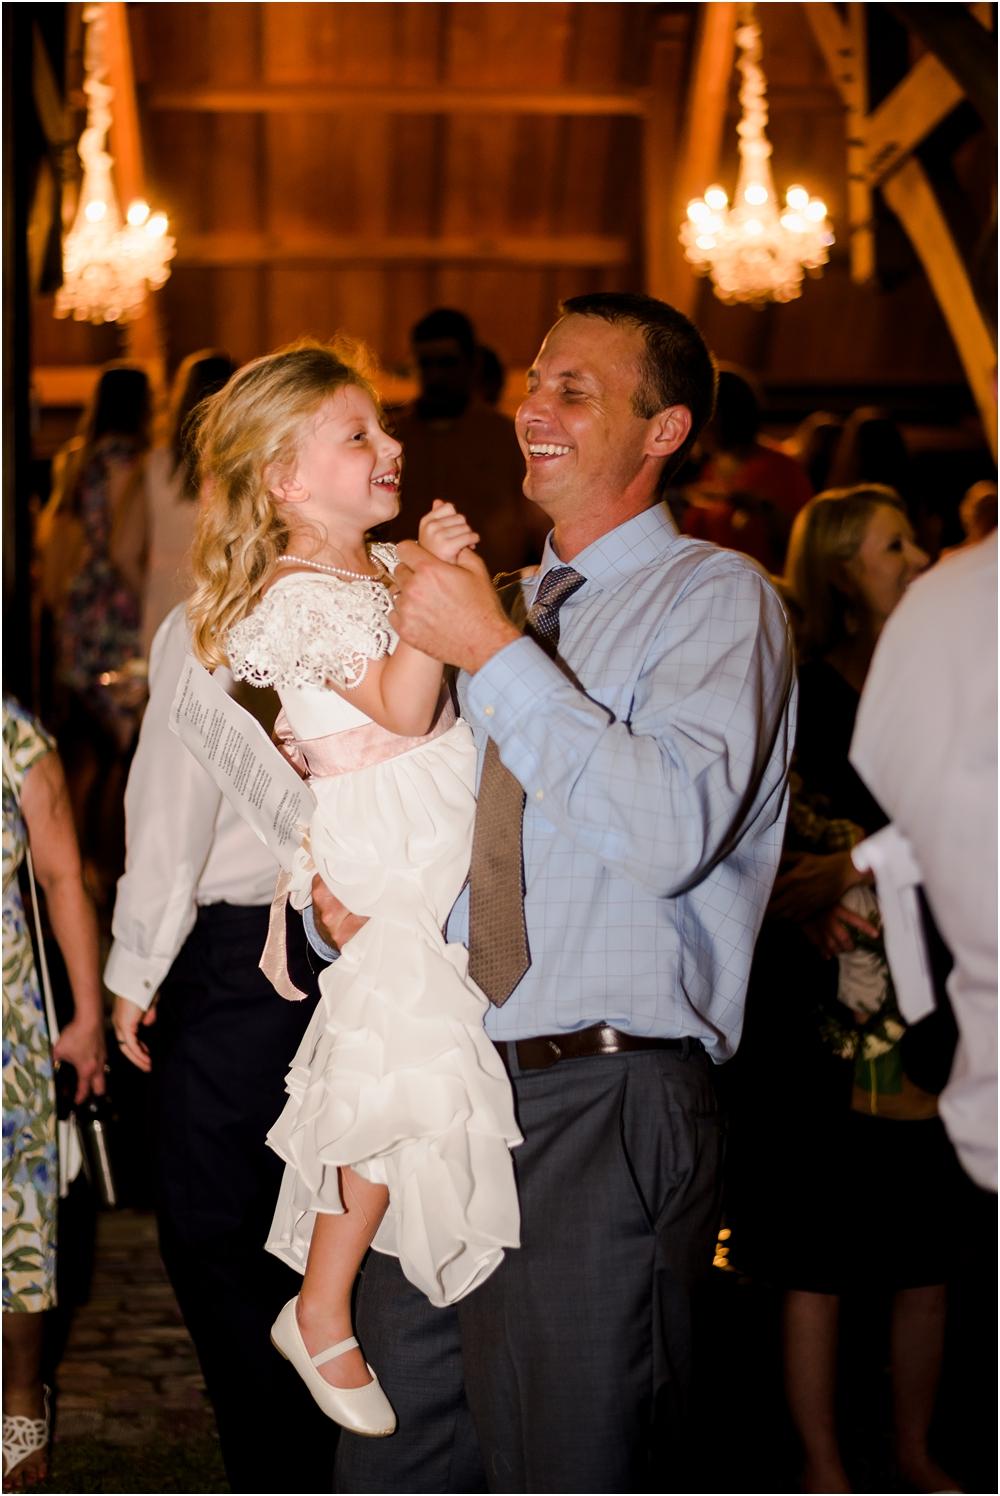 marianna-florida-wedding-photographer-kiersten-grant-202.jpg